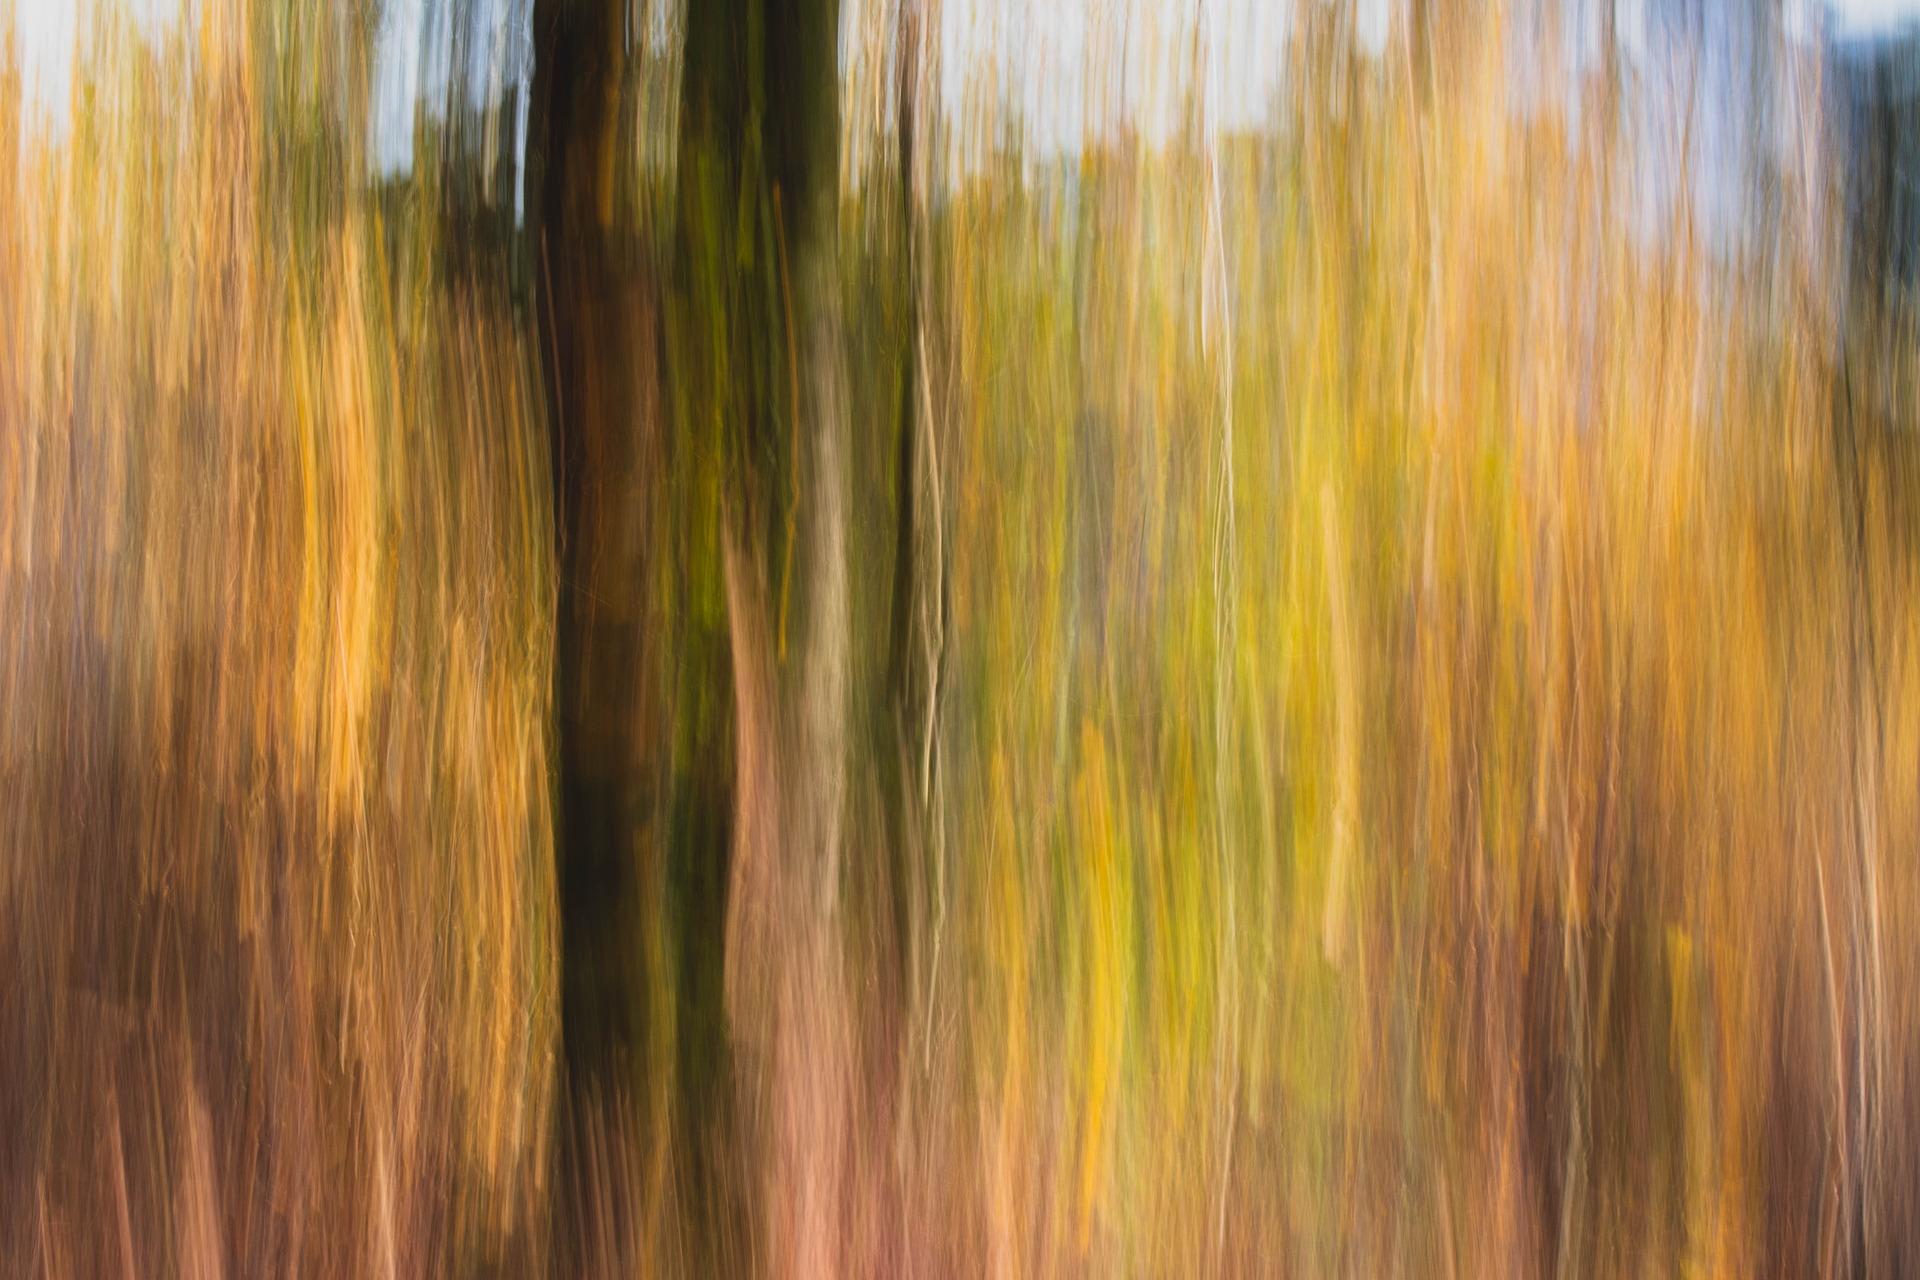 forest-3779411_1920.jpg